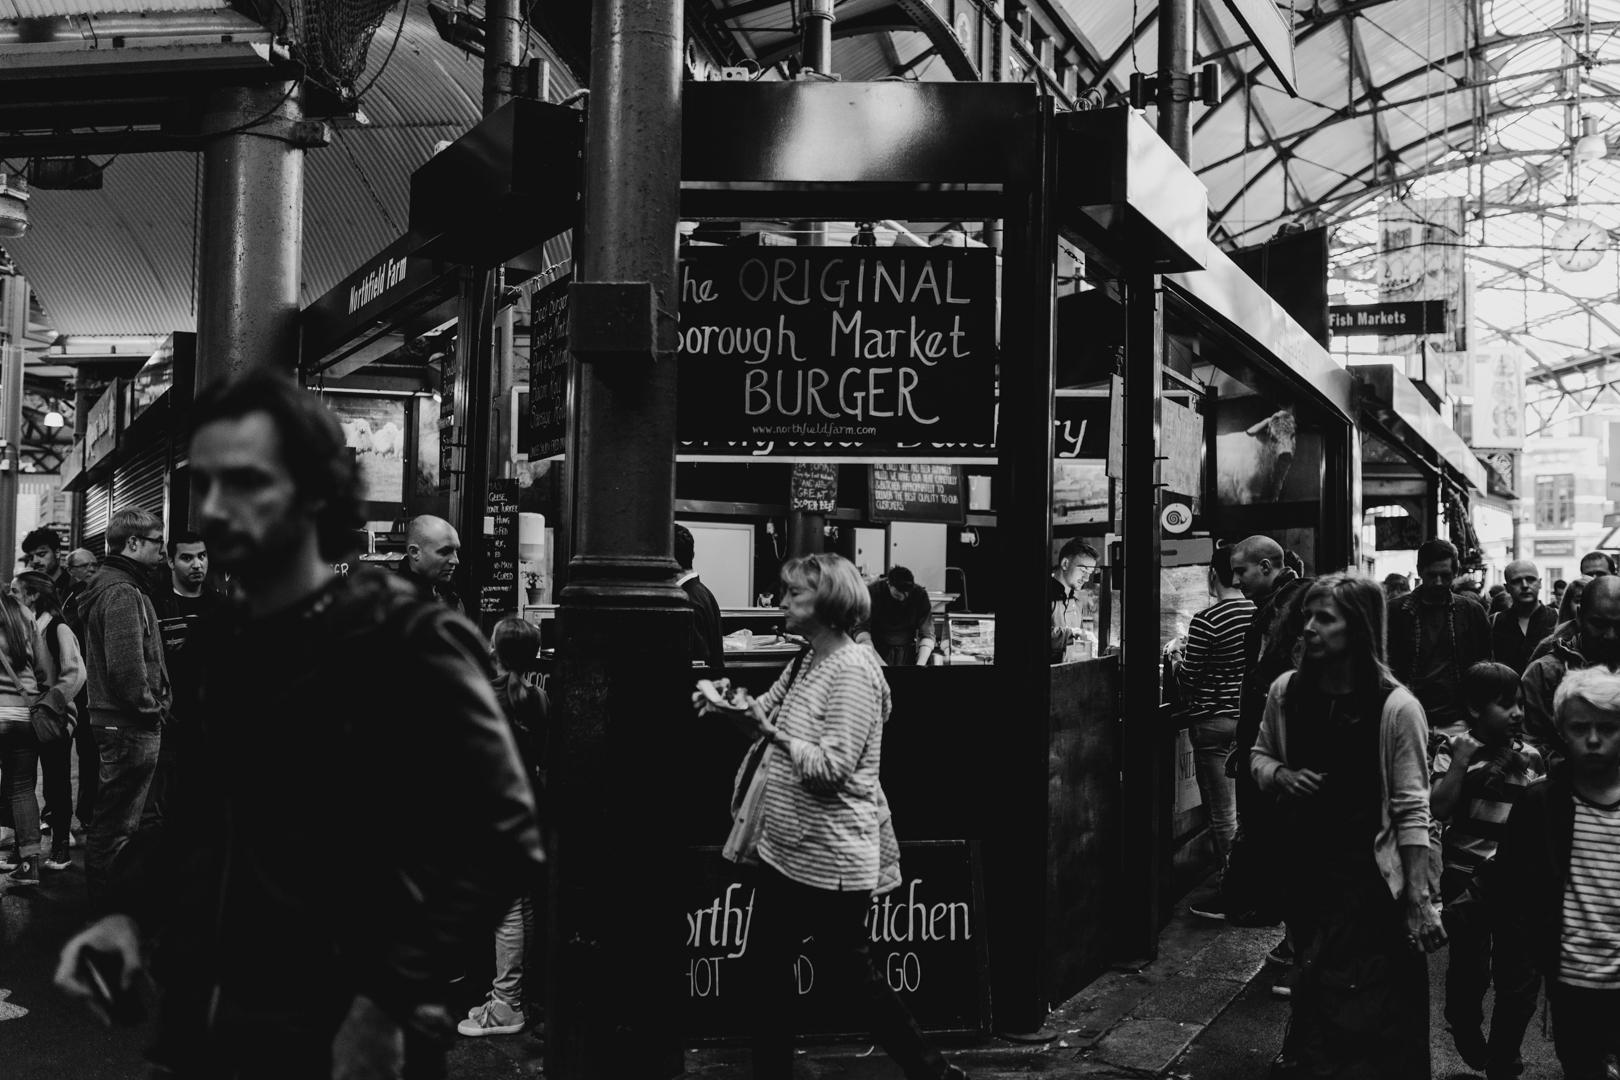 20151027_England_LondonCityGuide_2.jpg